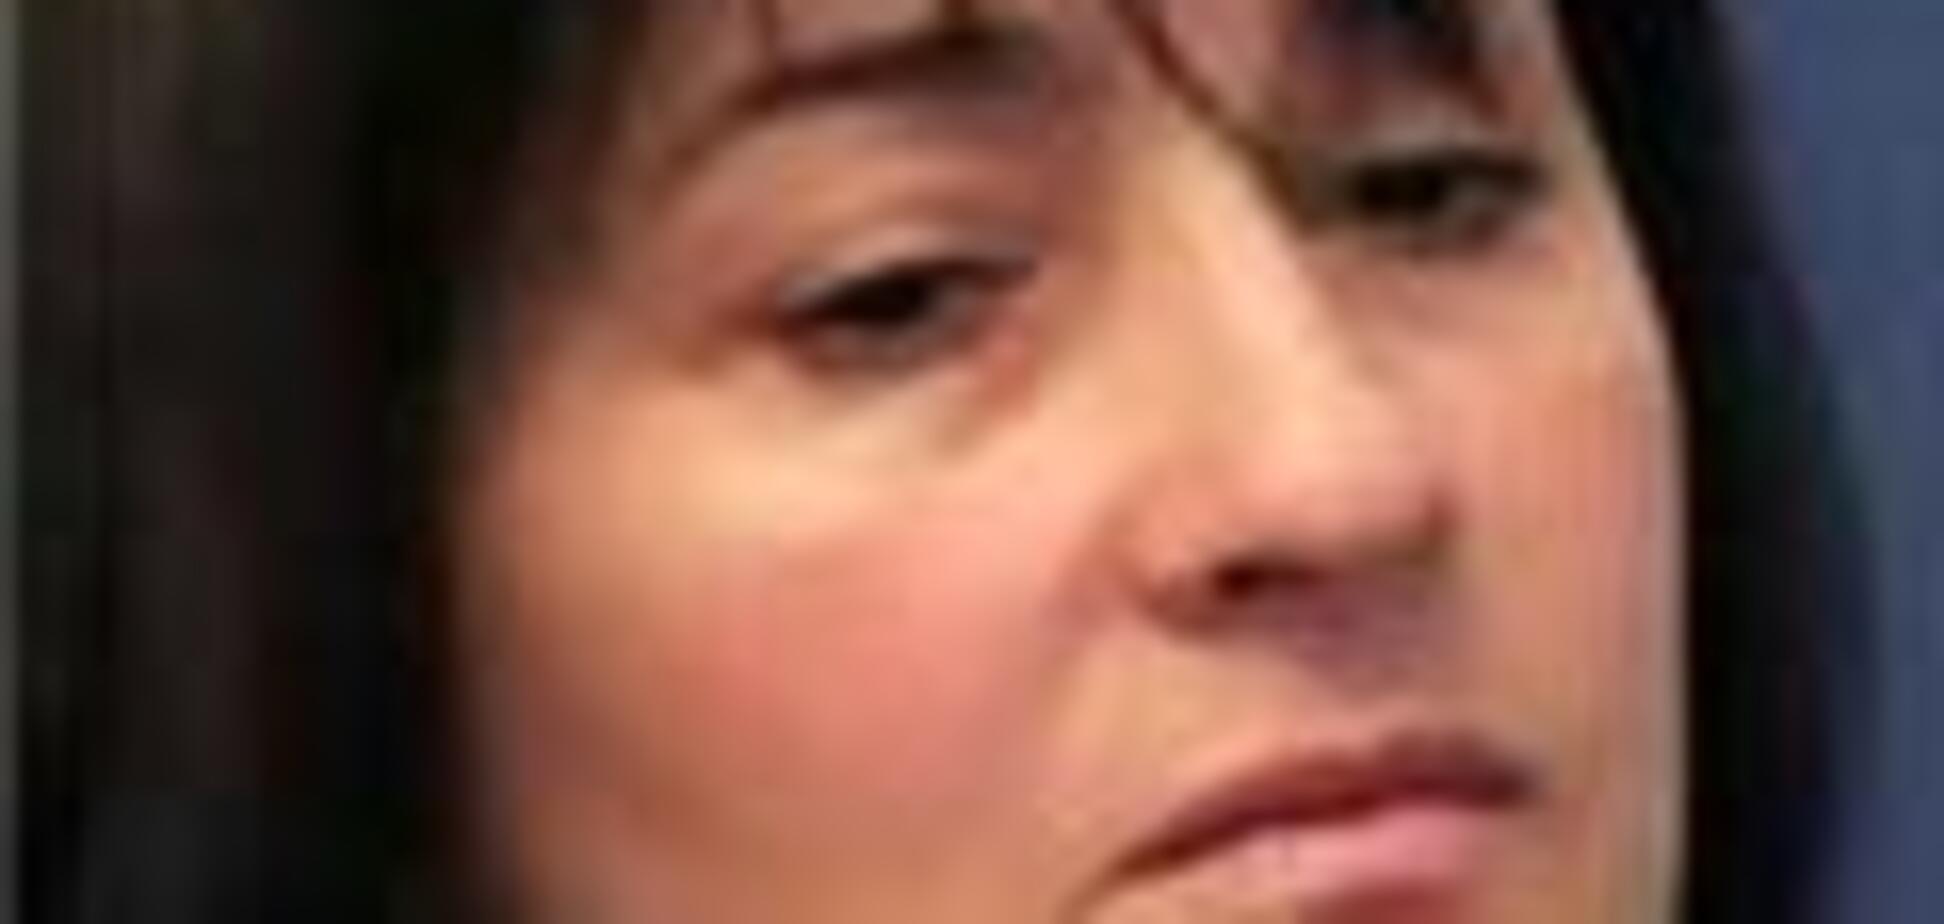 Герасим'юк піде з НСНУ, але депутатом залишиться